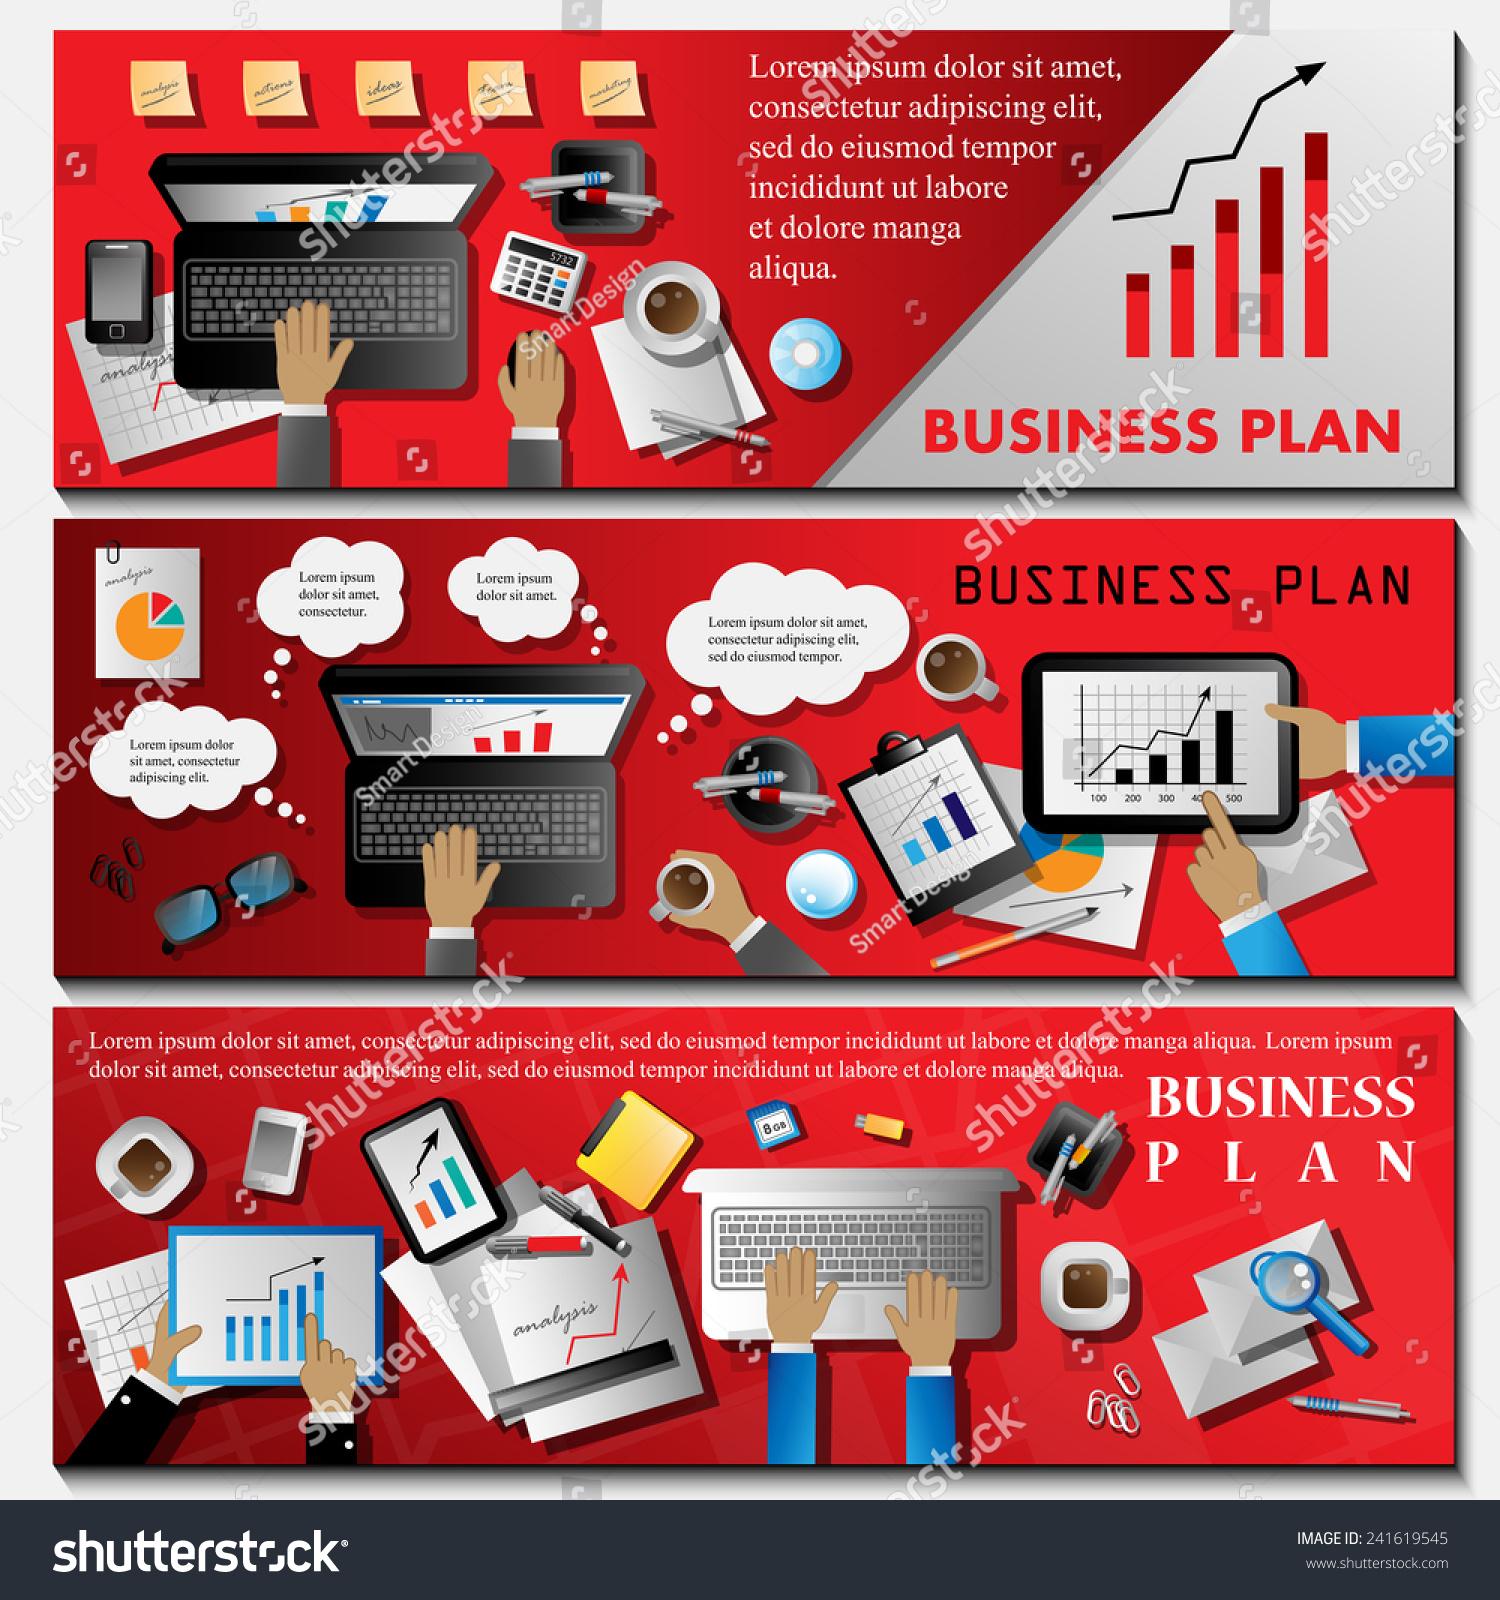 Business Plan Flyer Template Vector Illustration Stock Vector 241619545 Shutterstock